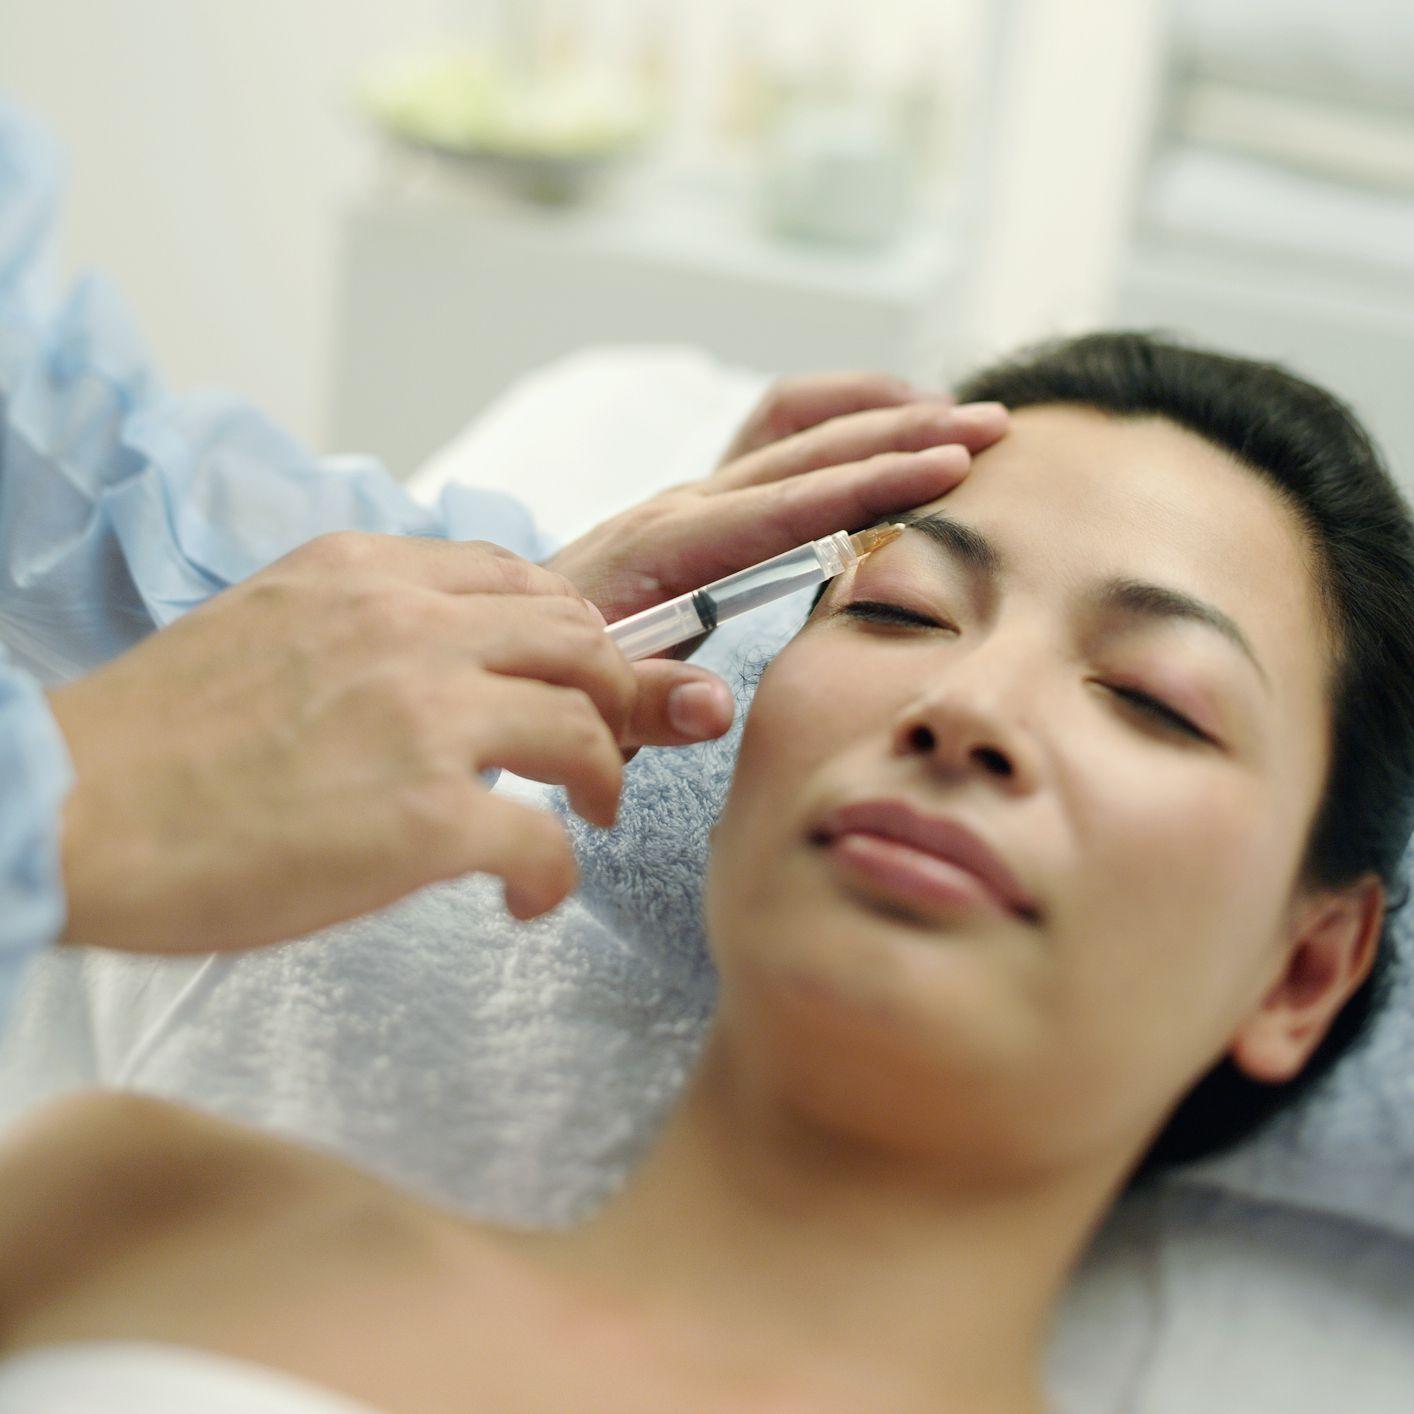 woman getting botox in brow